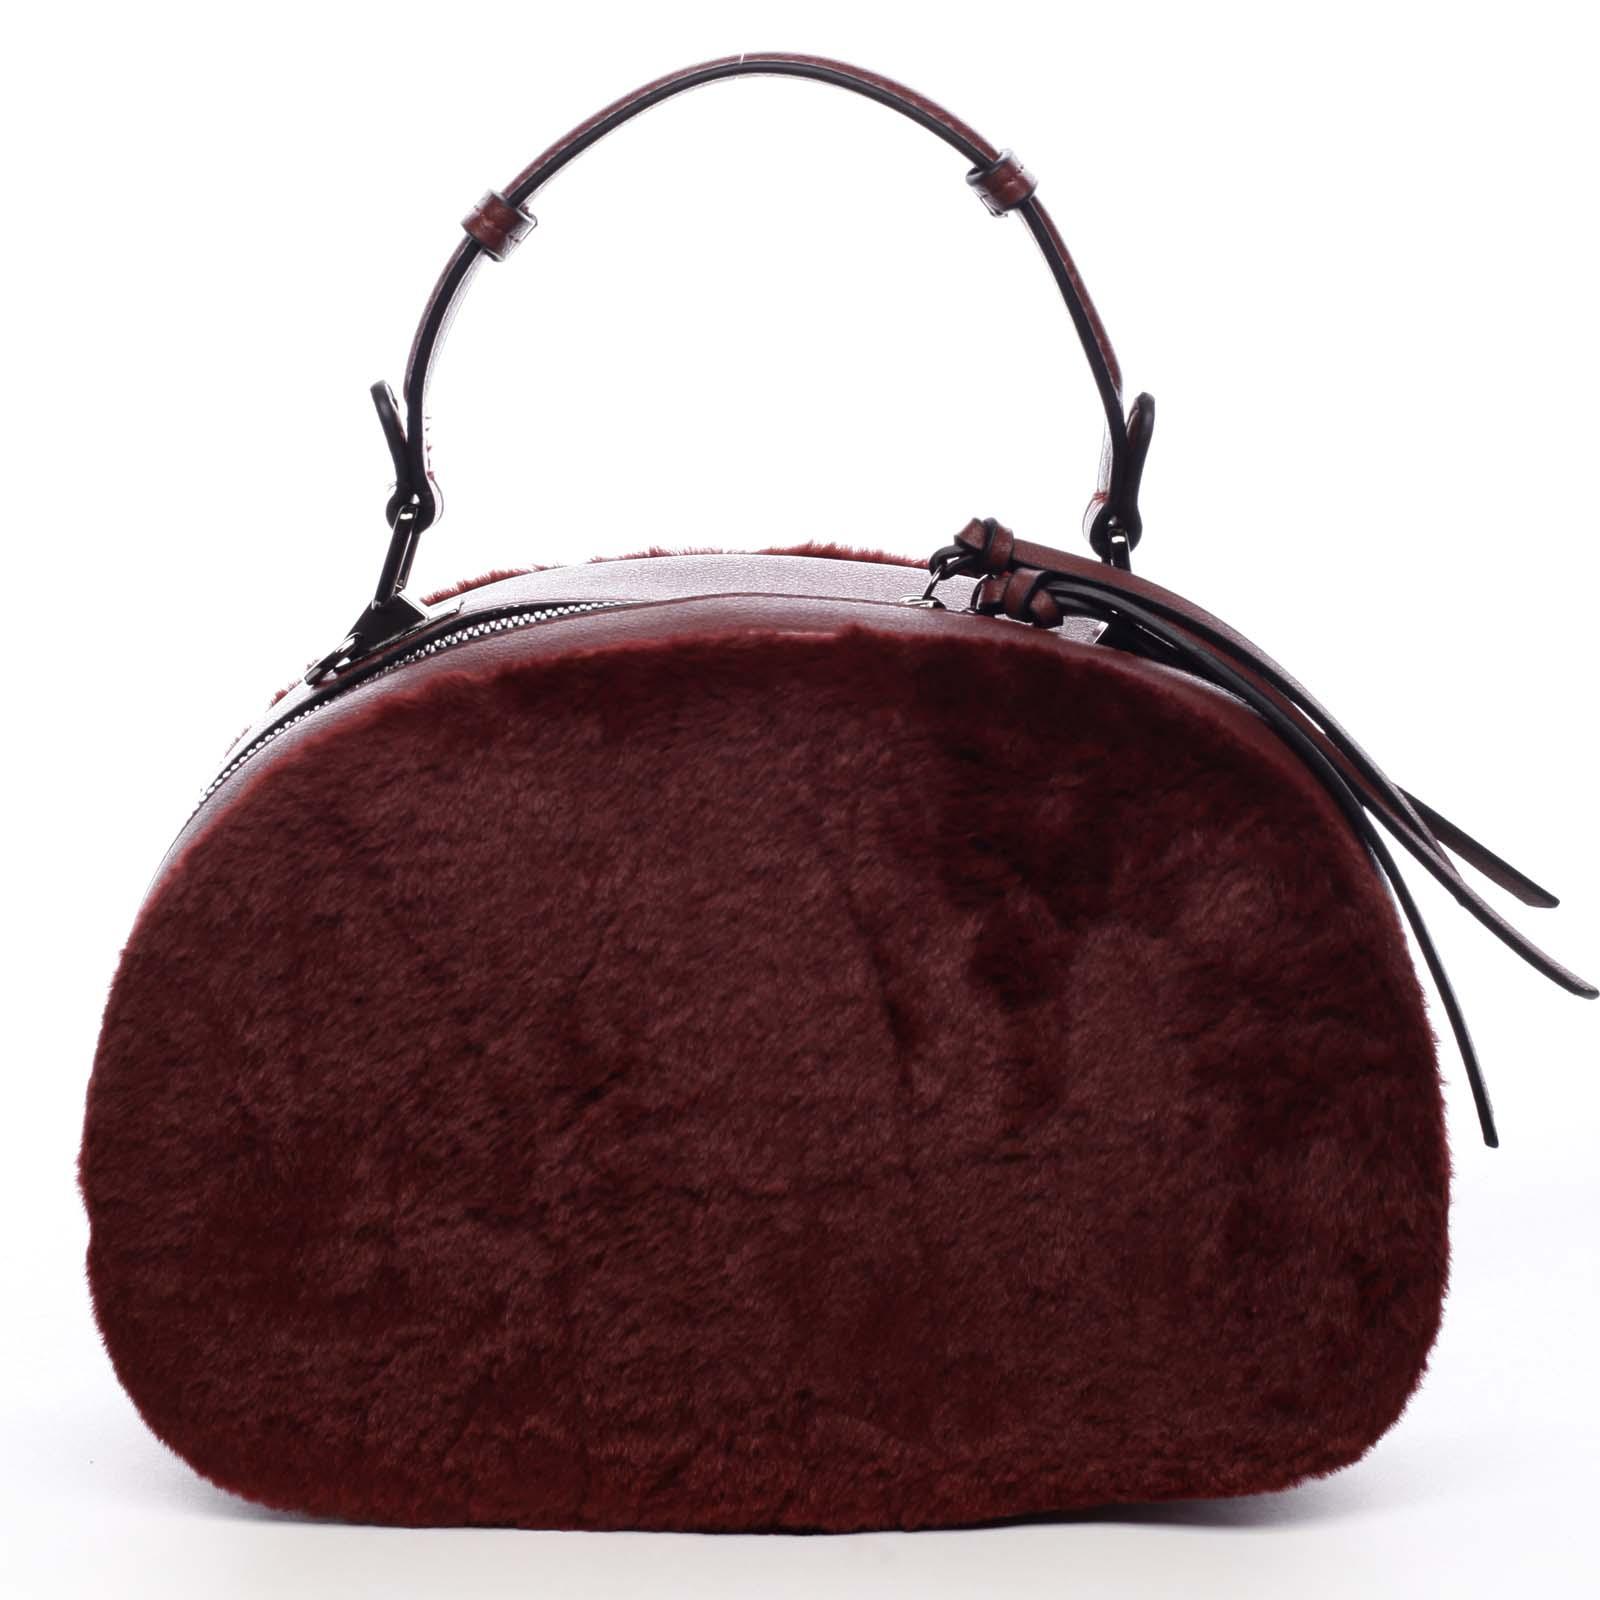 Dámská kožešinová kabelka vínová - MARIA C Hasiel